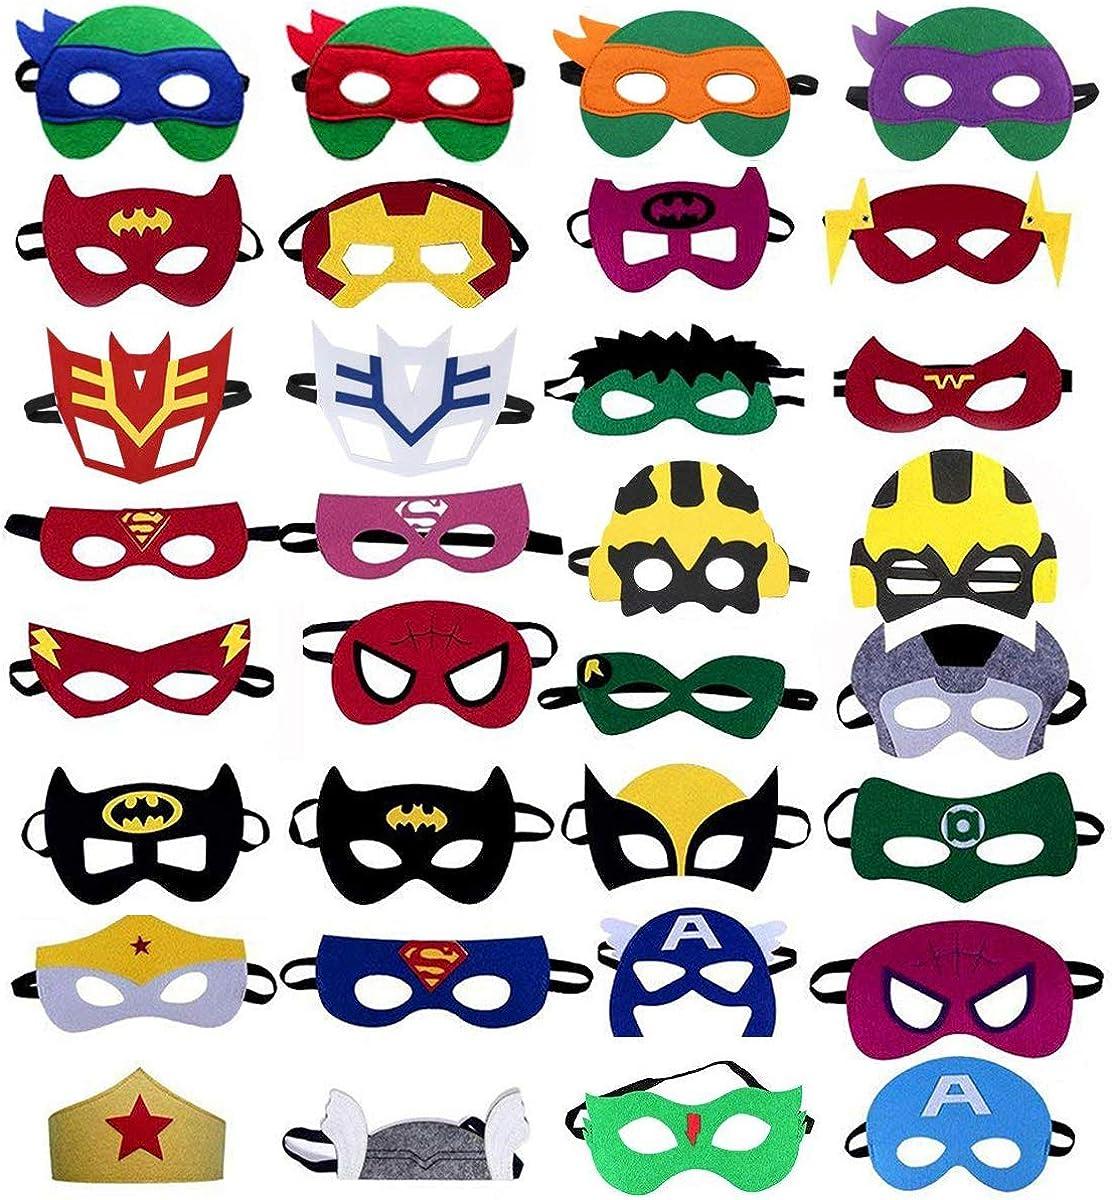 KetaKids Superheroes Party Masks 30 Pieces Superhero Masks for Children Aged 3+